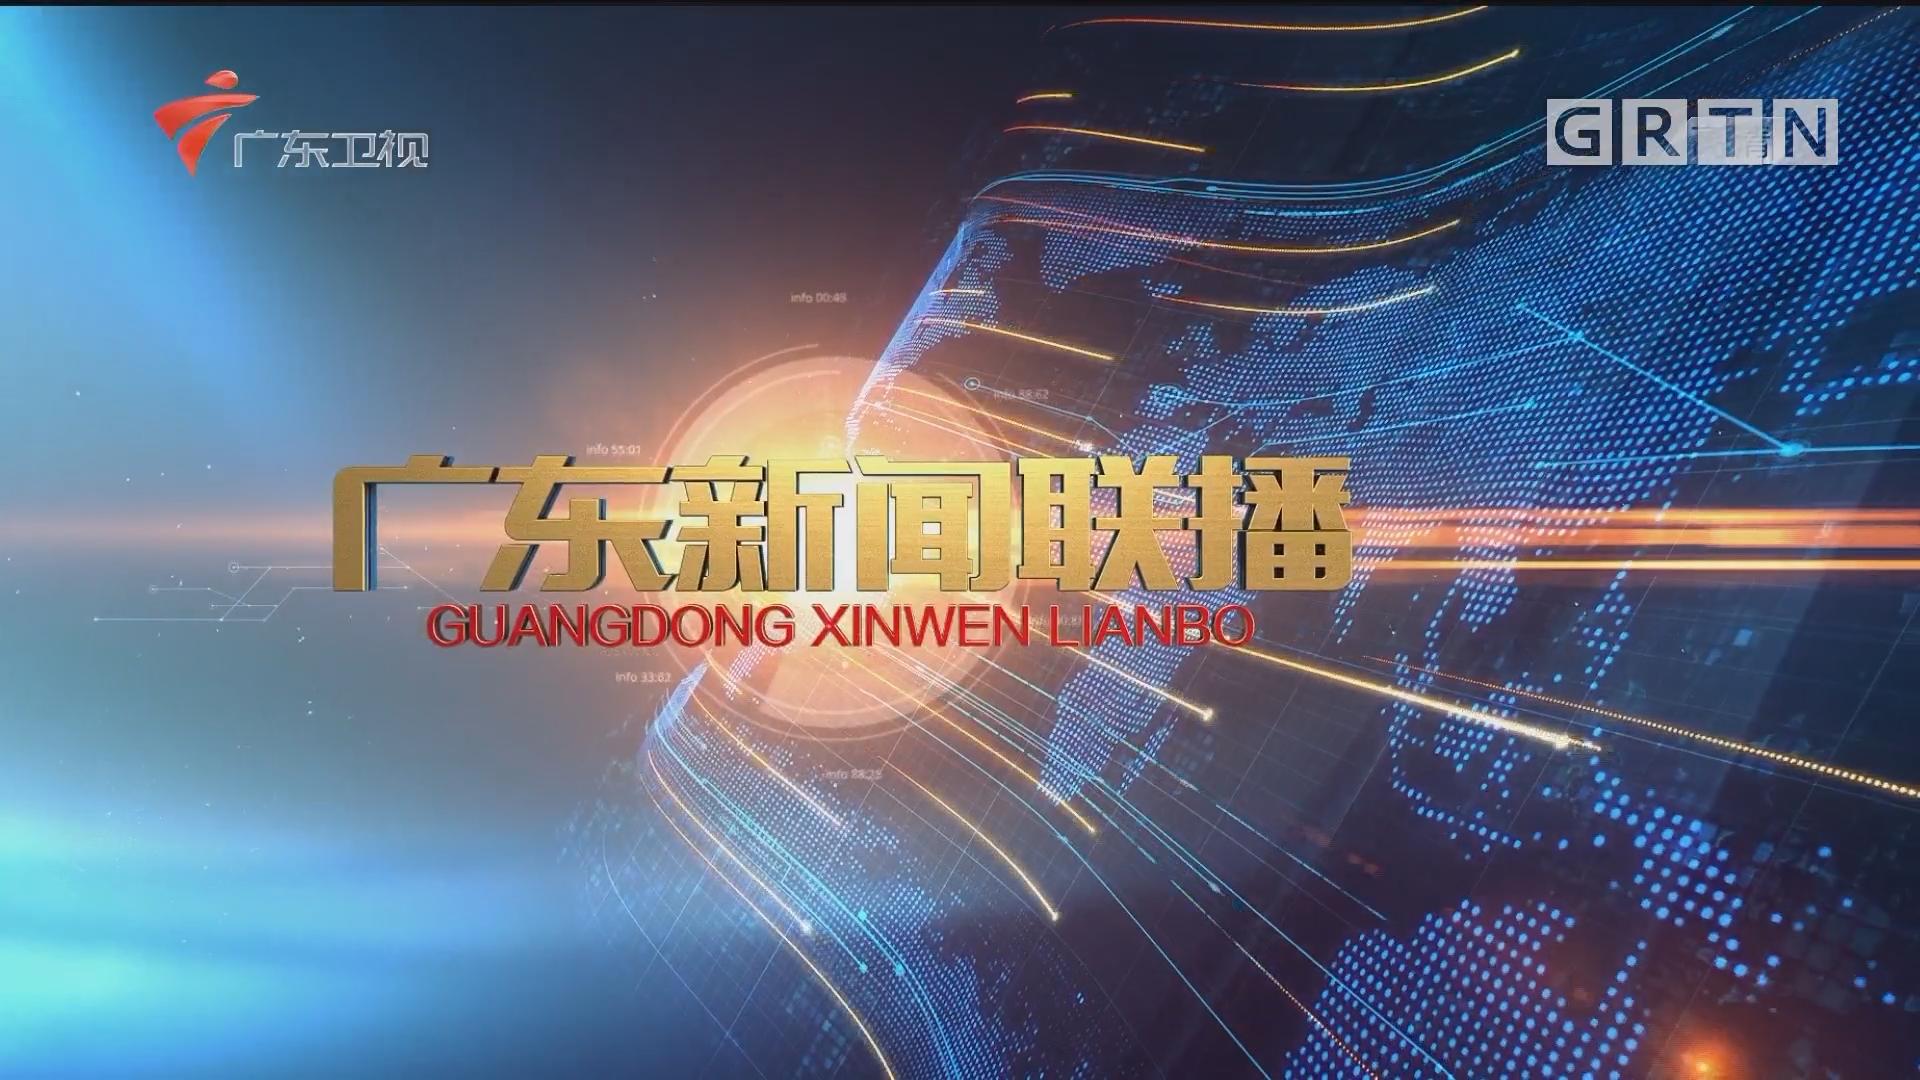 [HD][2017-12-03]广东新闻联播:第四届世界互联网大会在浙江乌镇开幕